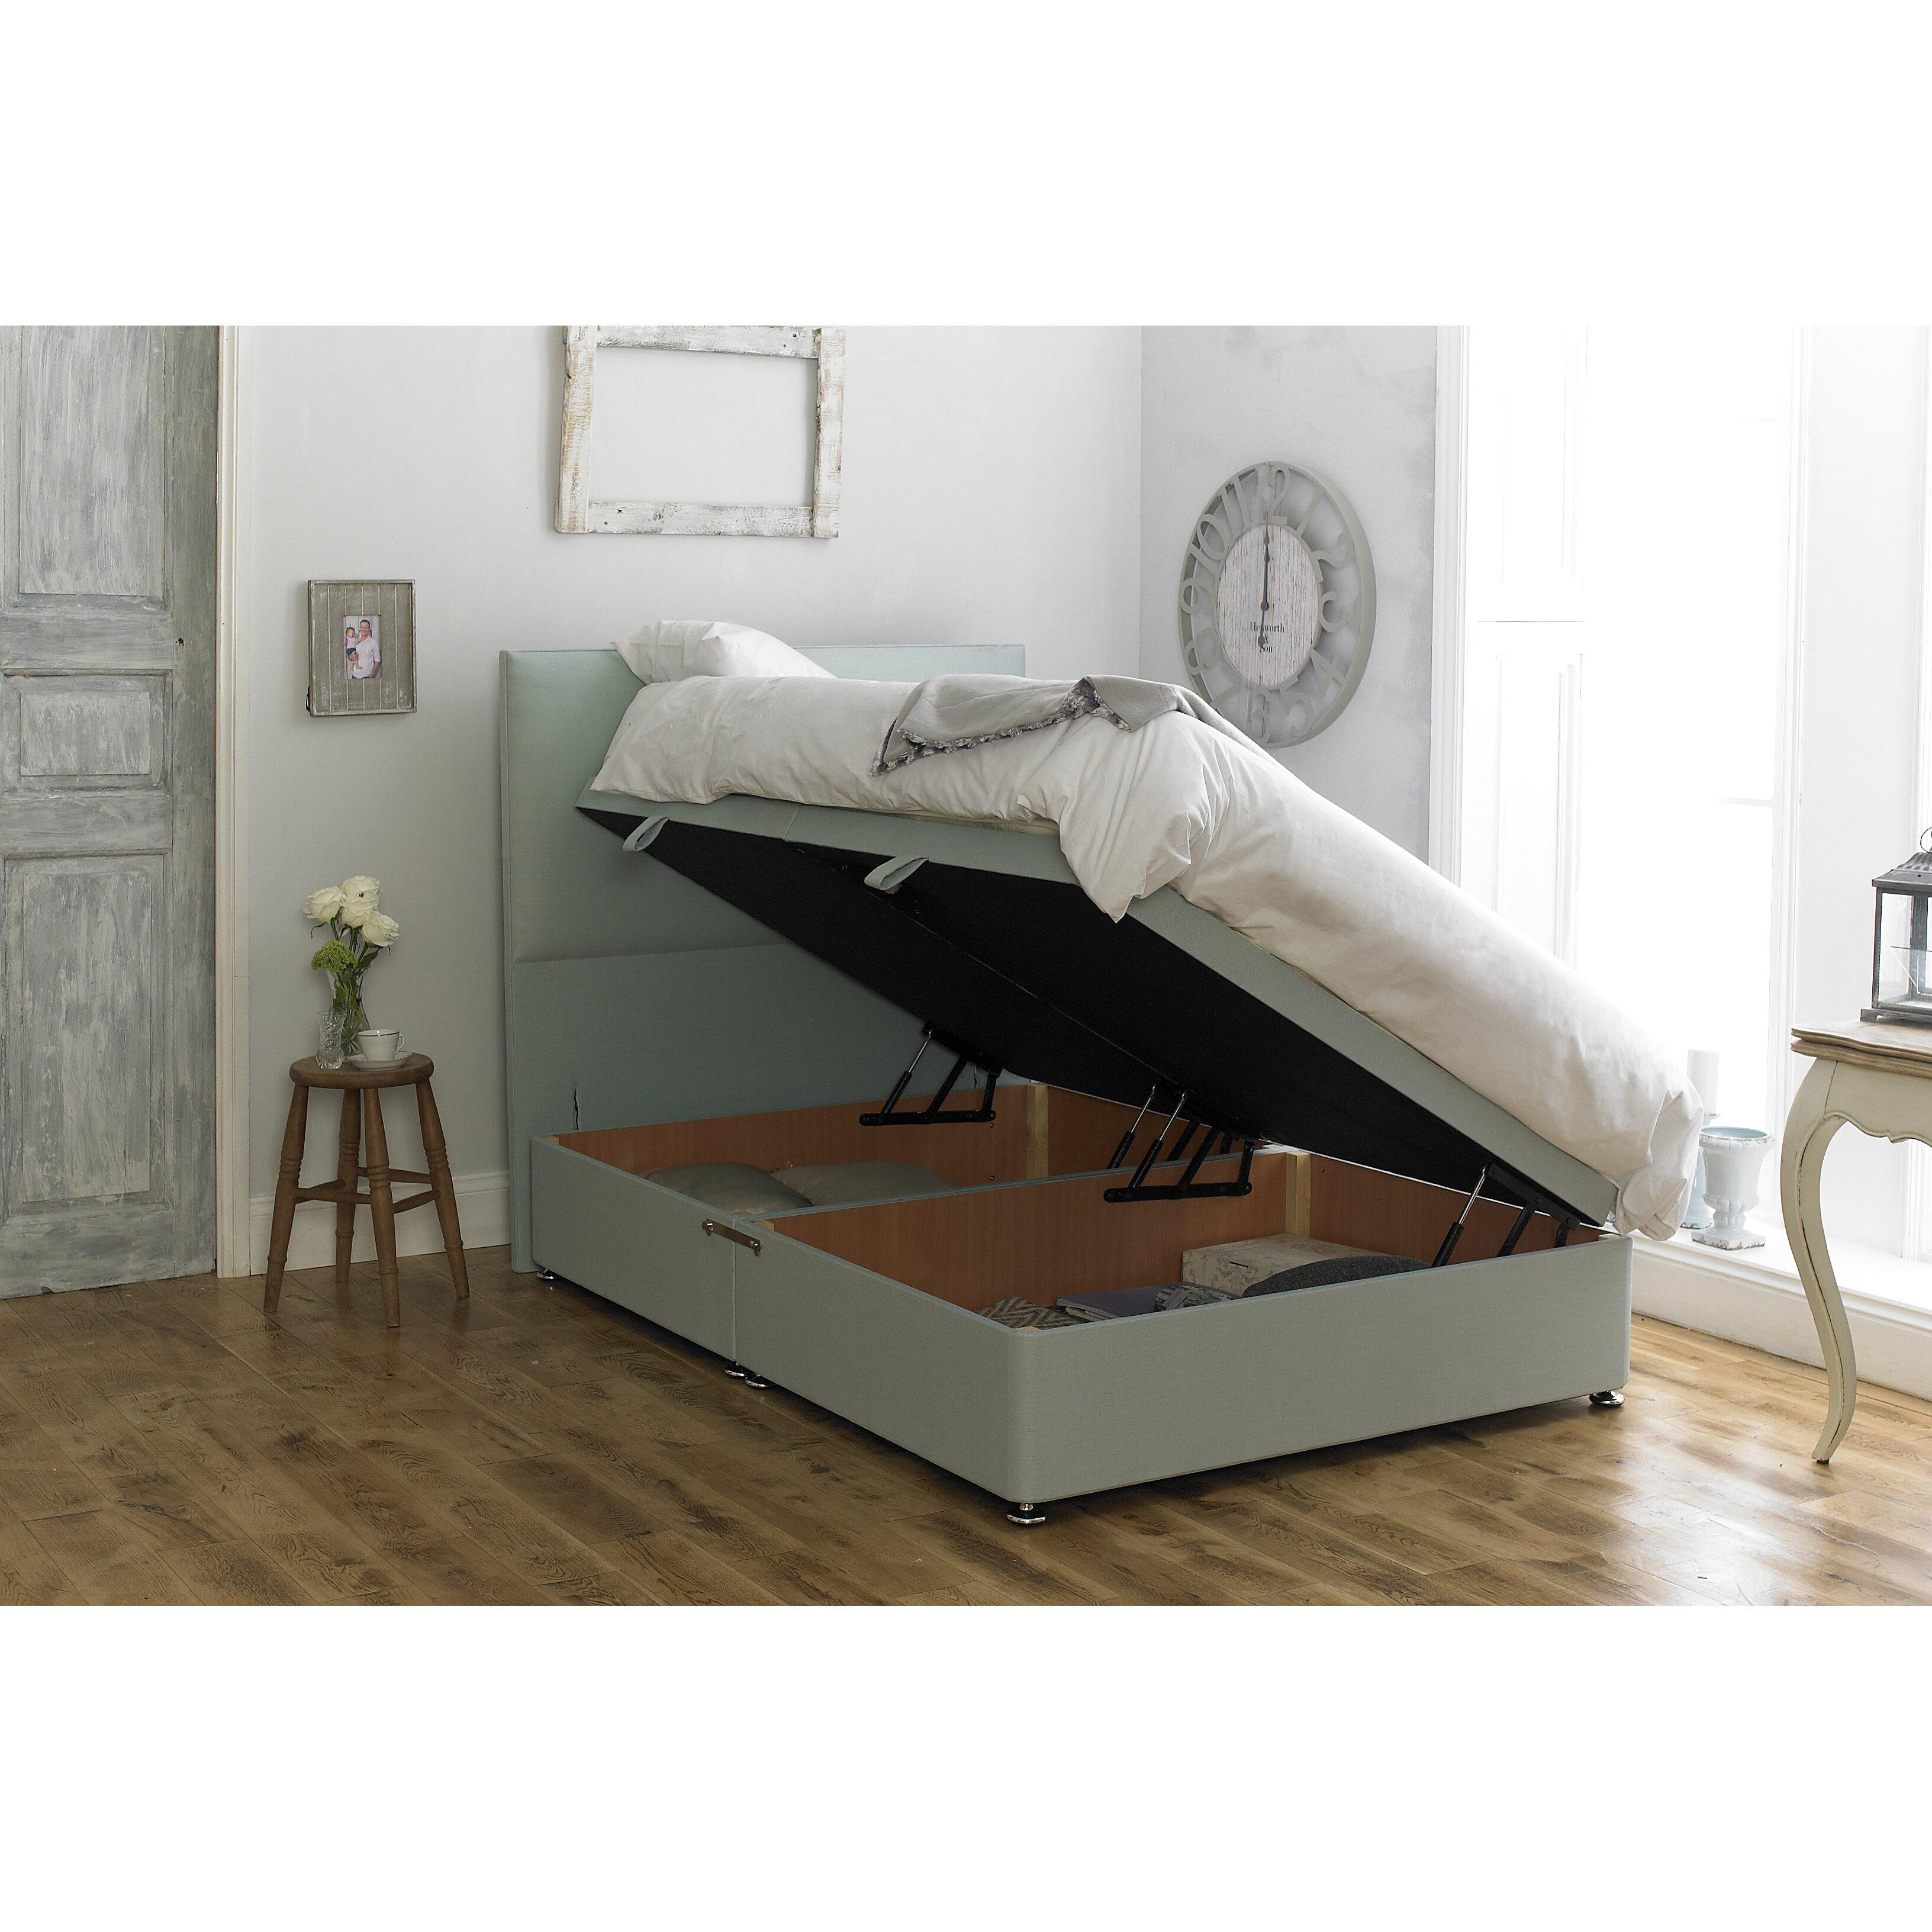 Home loft concept tarifa storage divan base wayfair uk for 2 6 divan with storage